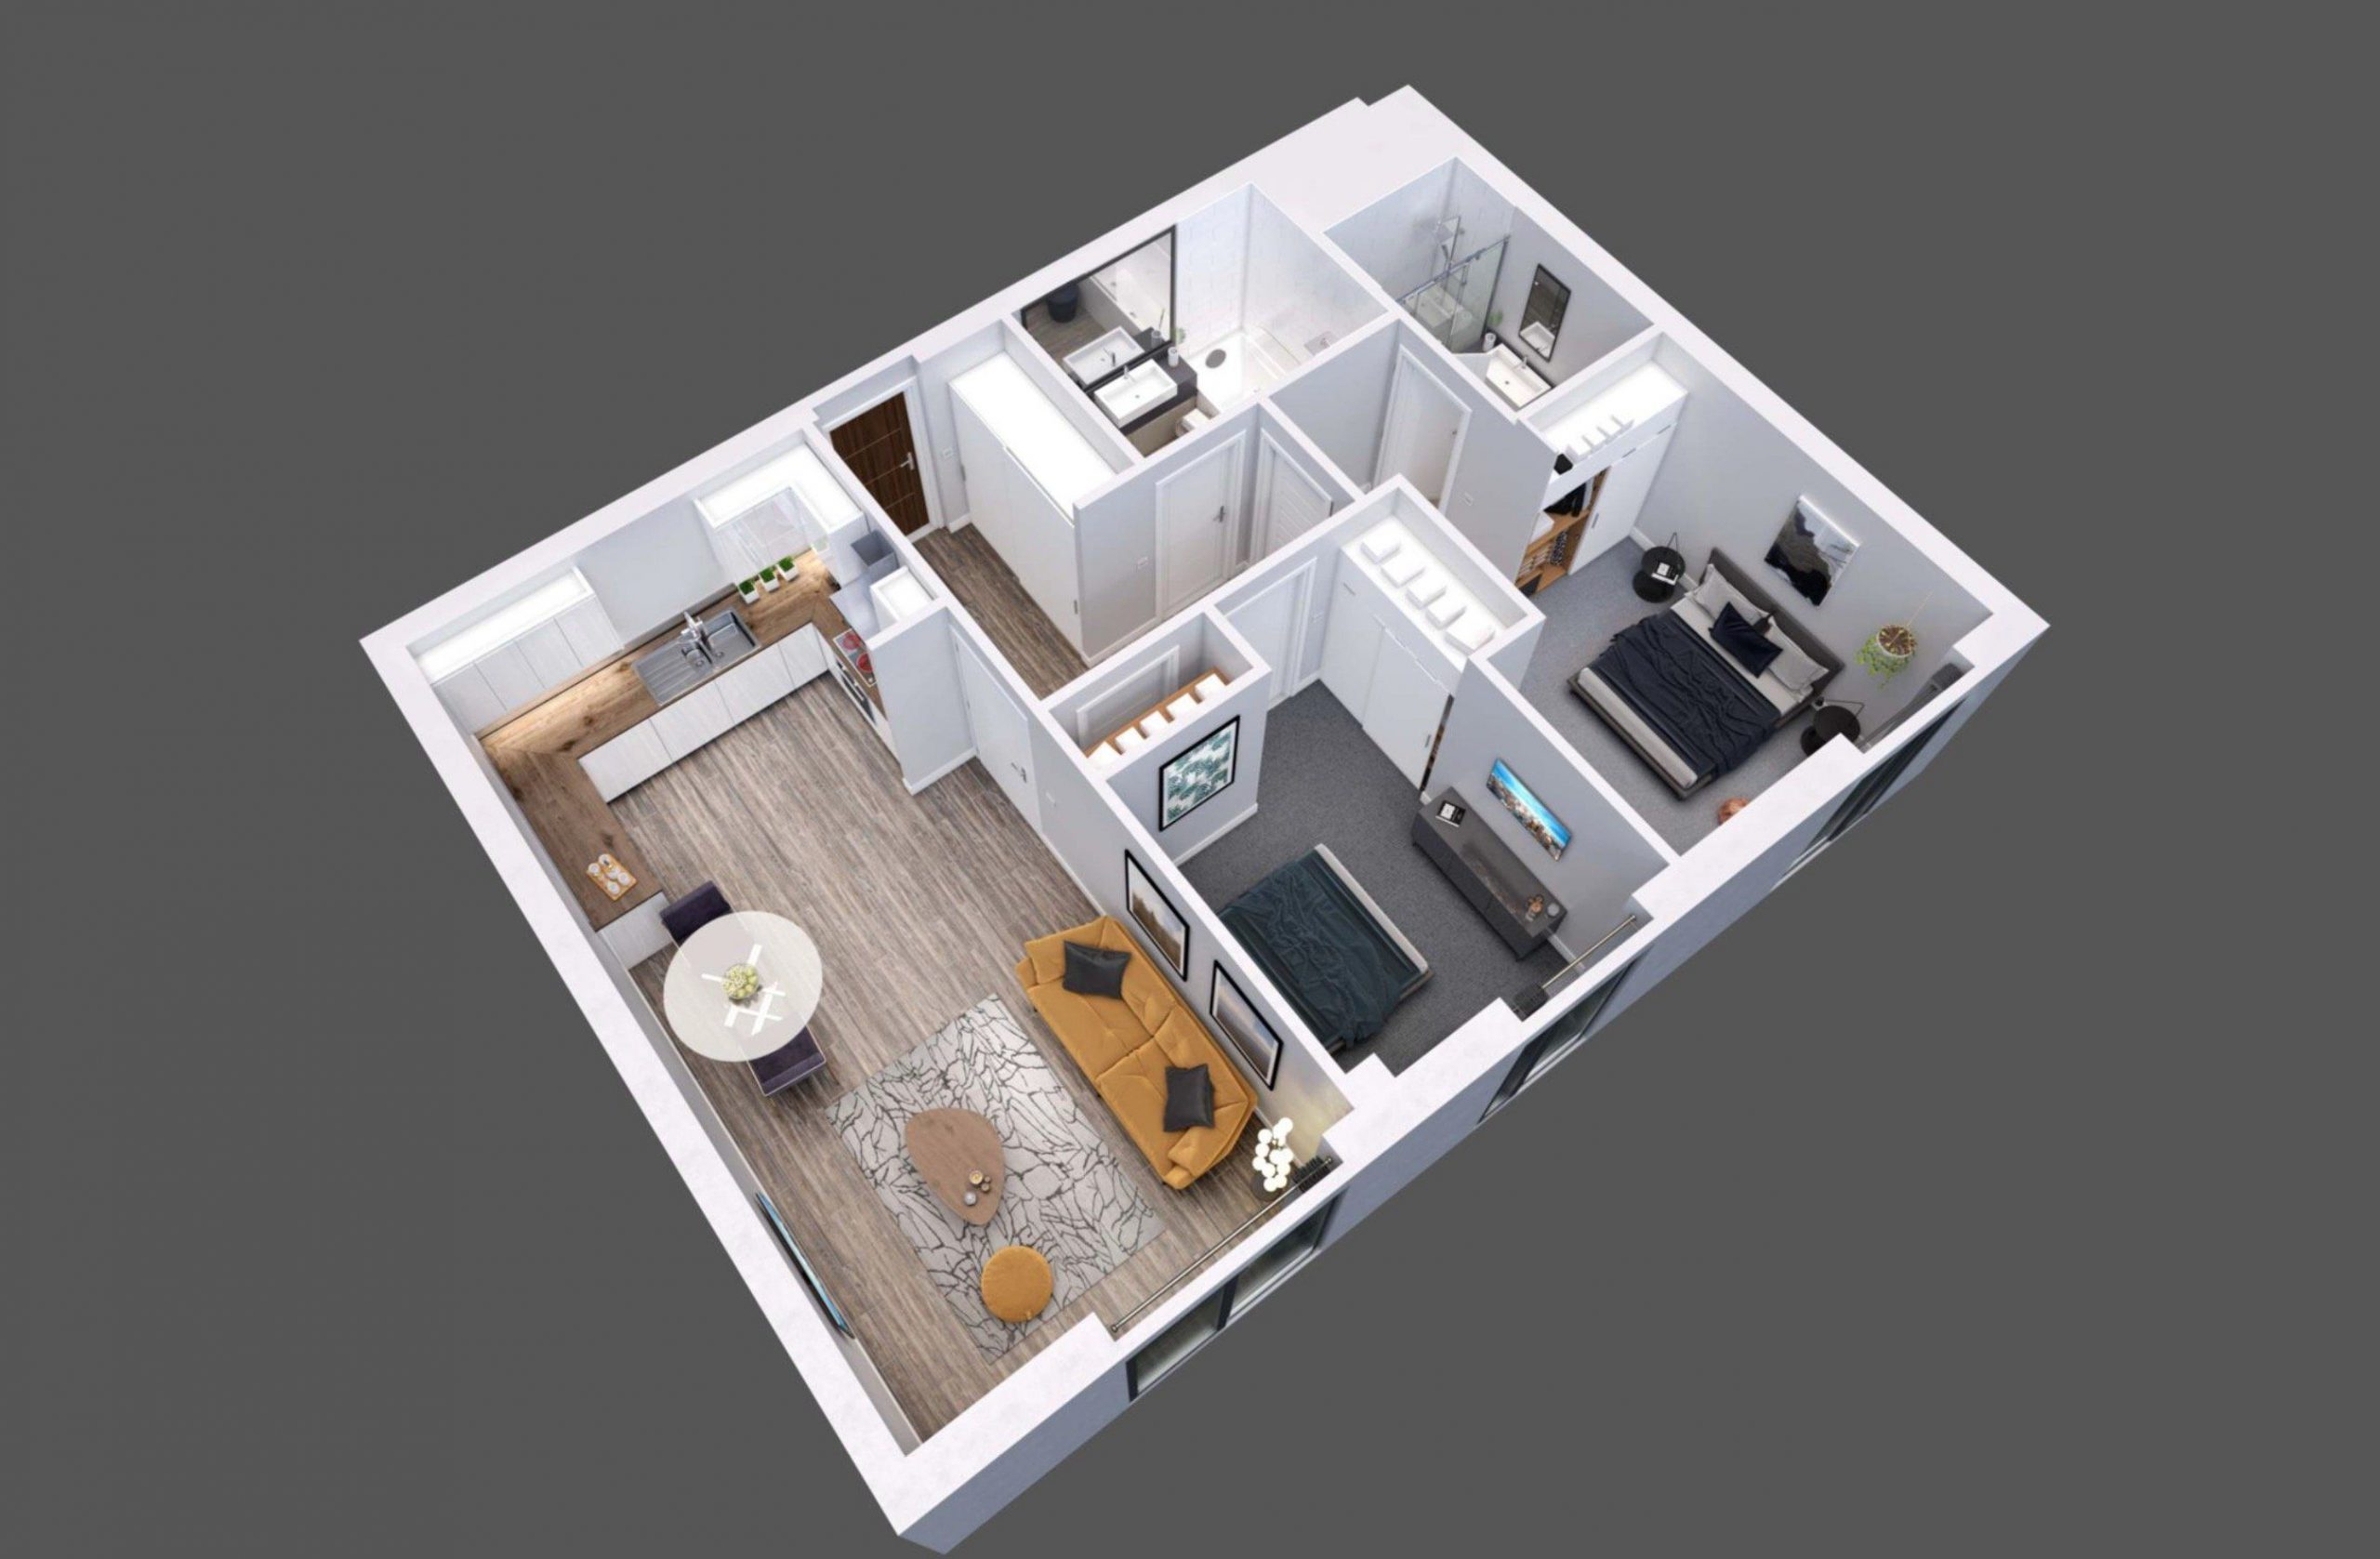 axonometric-floorplan-visual